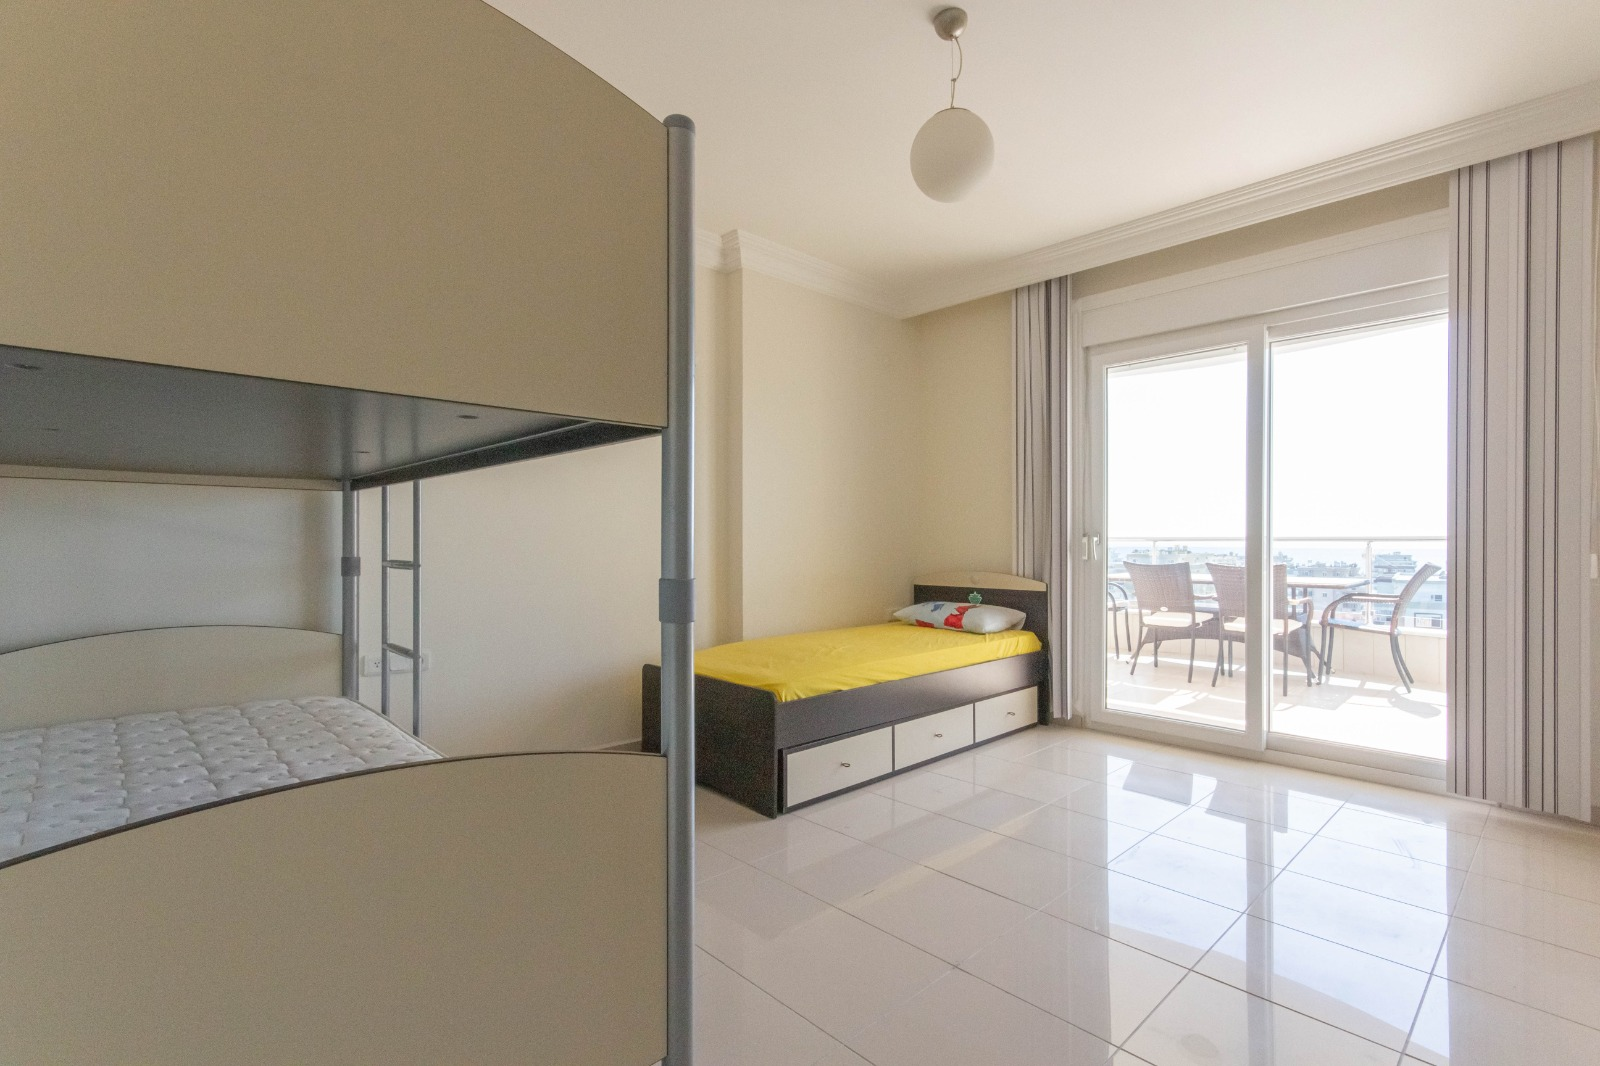 Меблированная квартира 2+1 с видом на море. - Фото 23